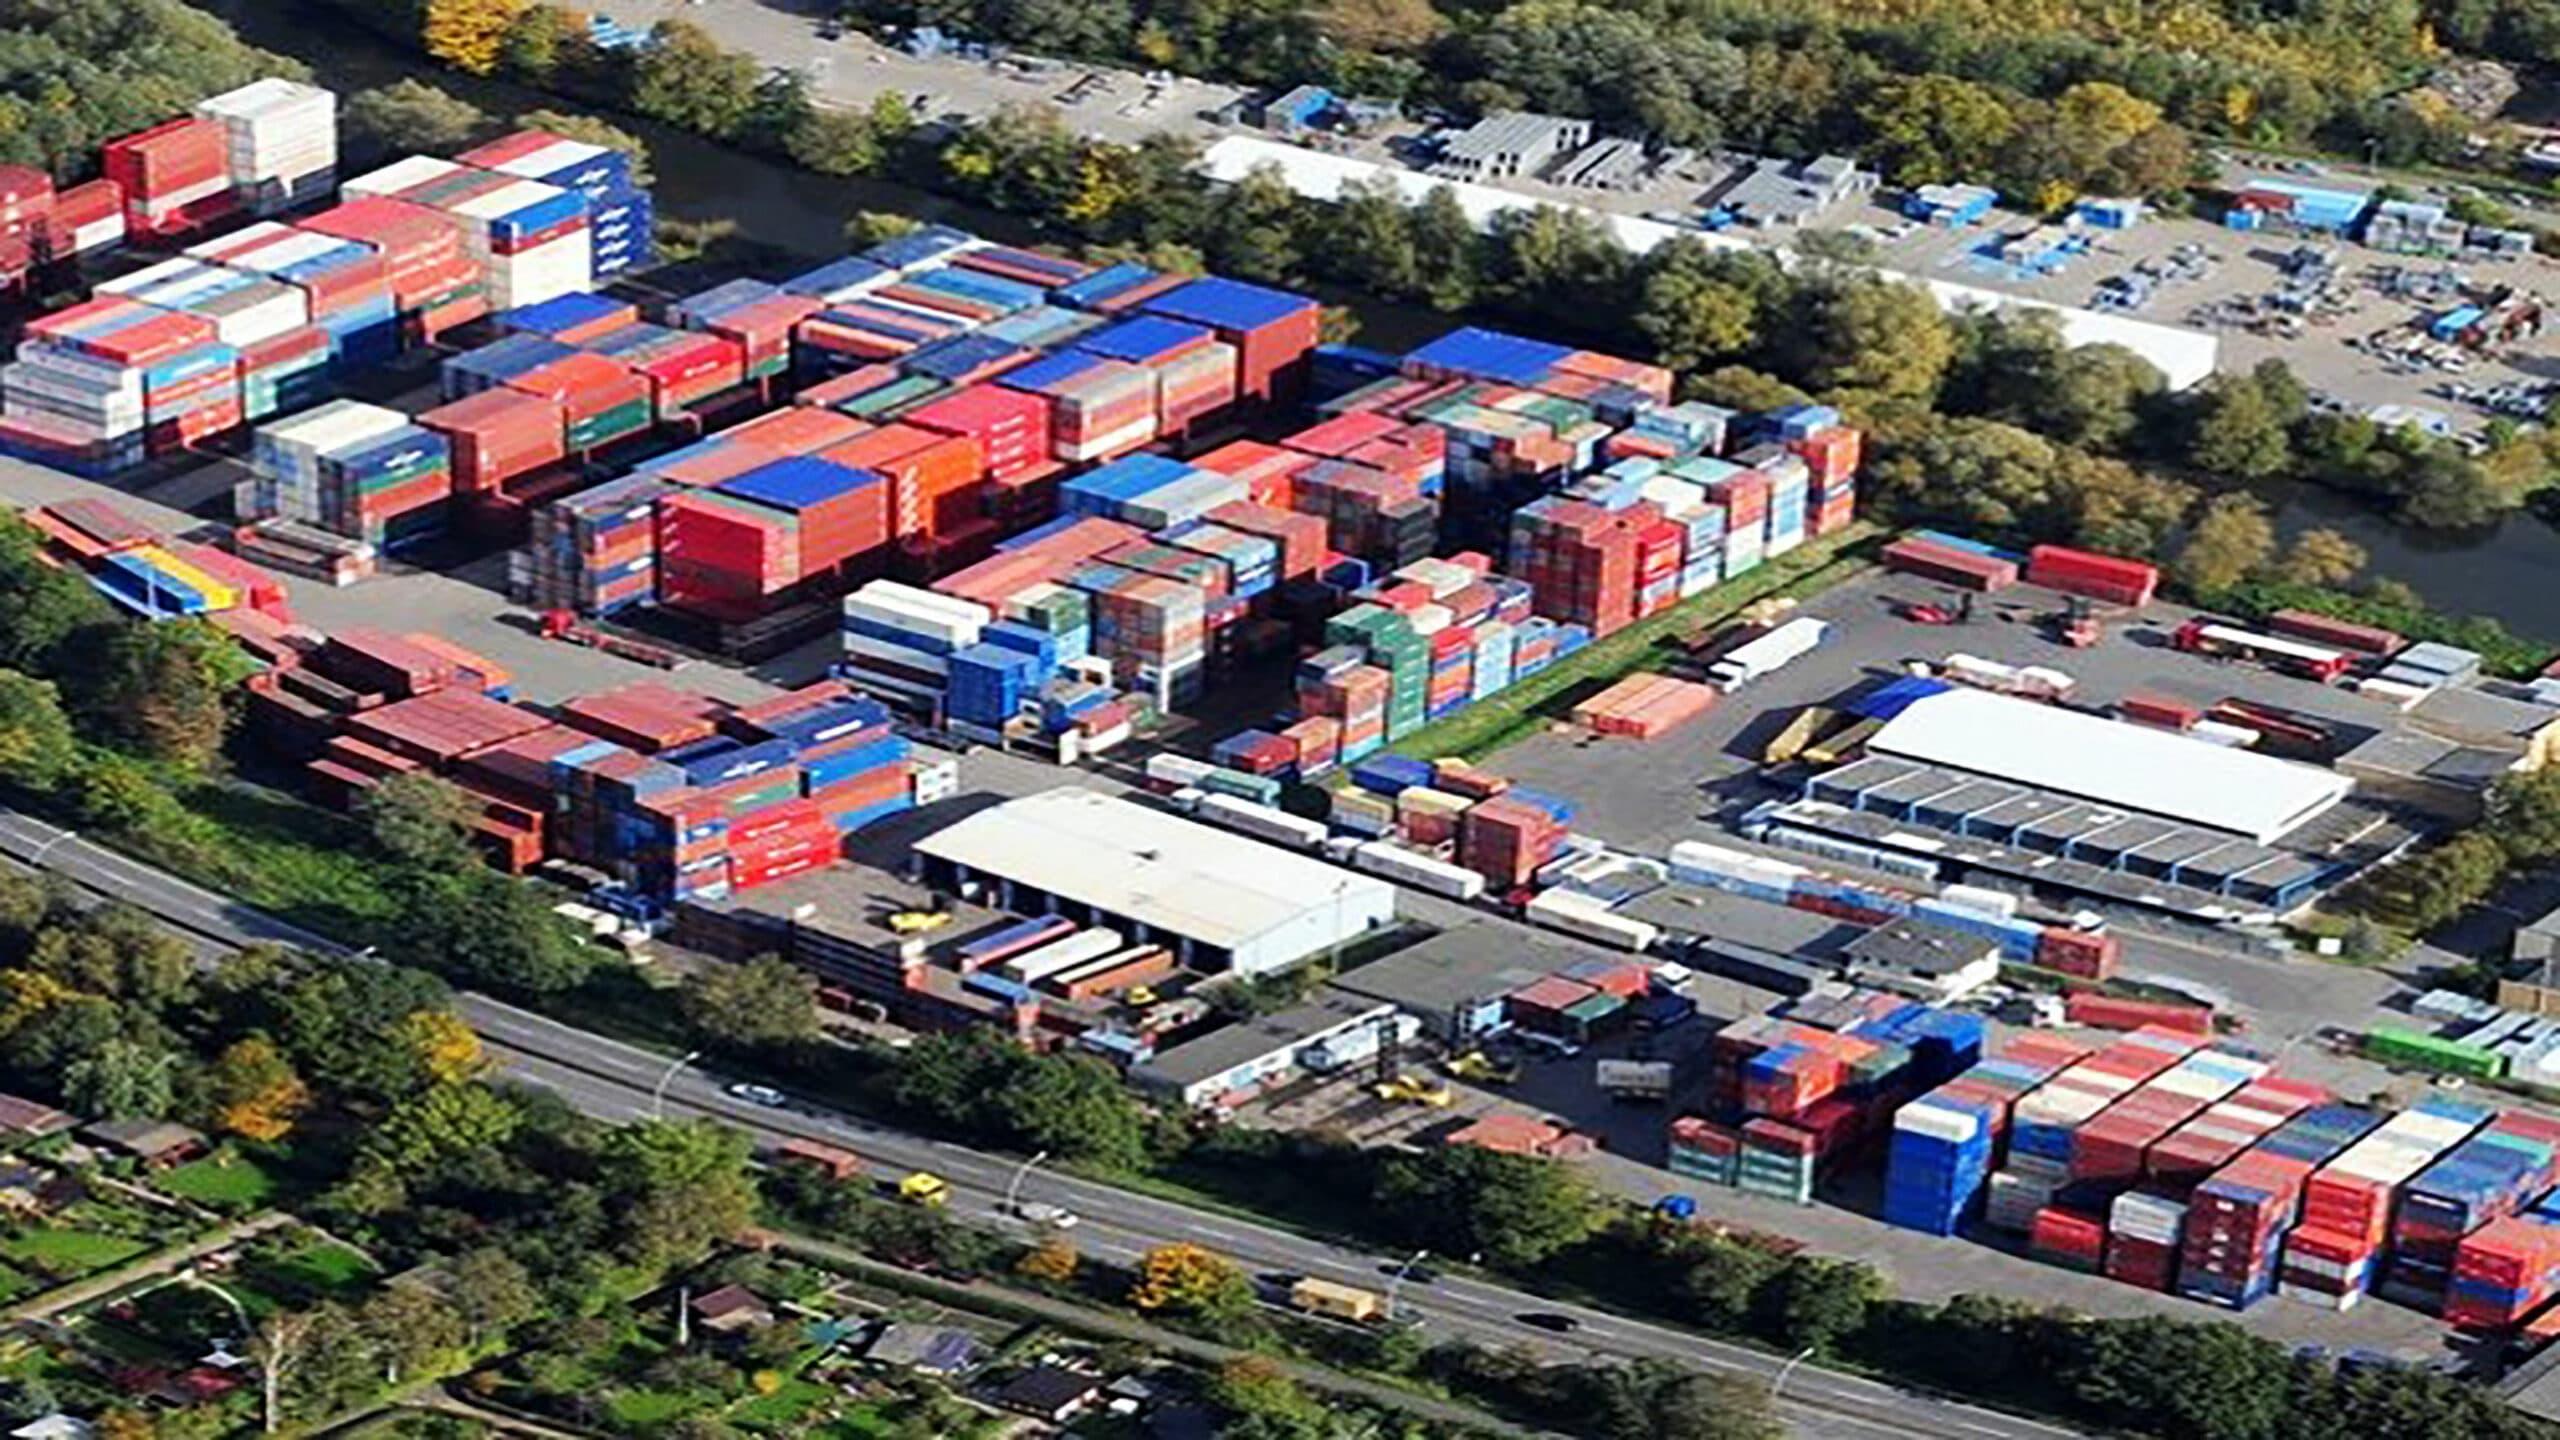 Hamburg: Breeze Industrial Packing GmbH